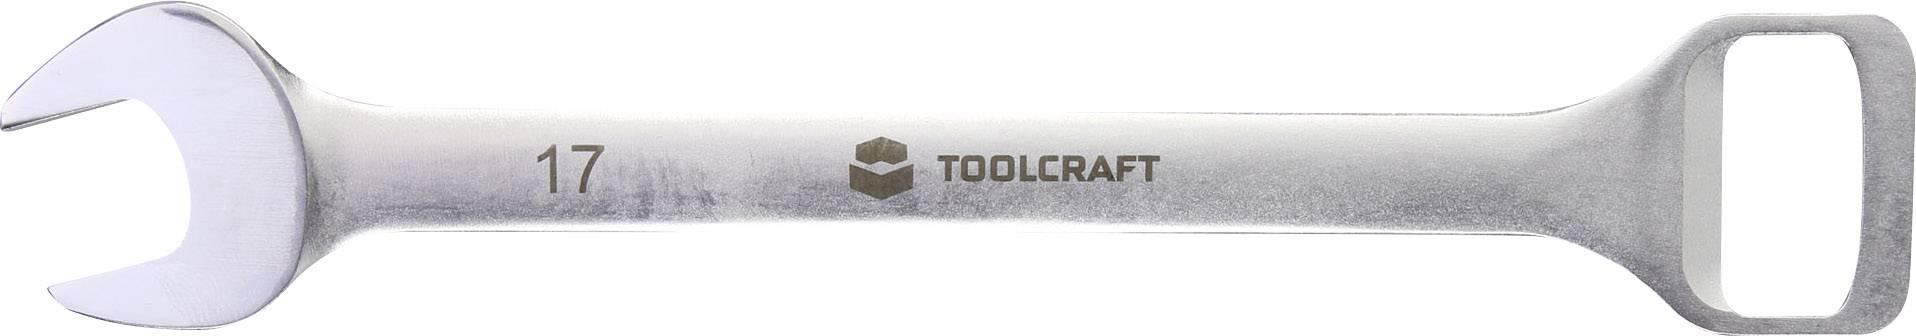 TOOLCRAFT, 17 mm